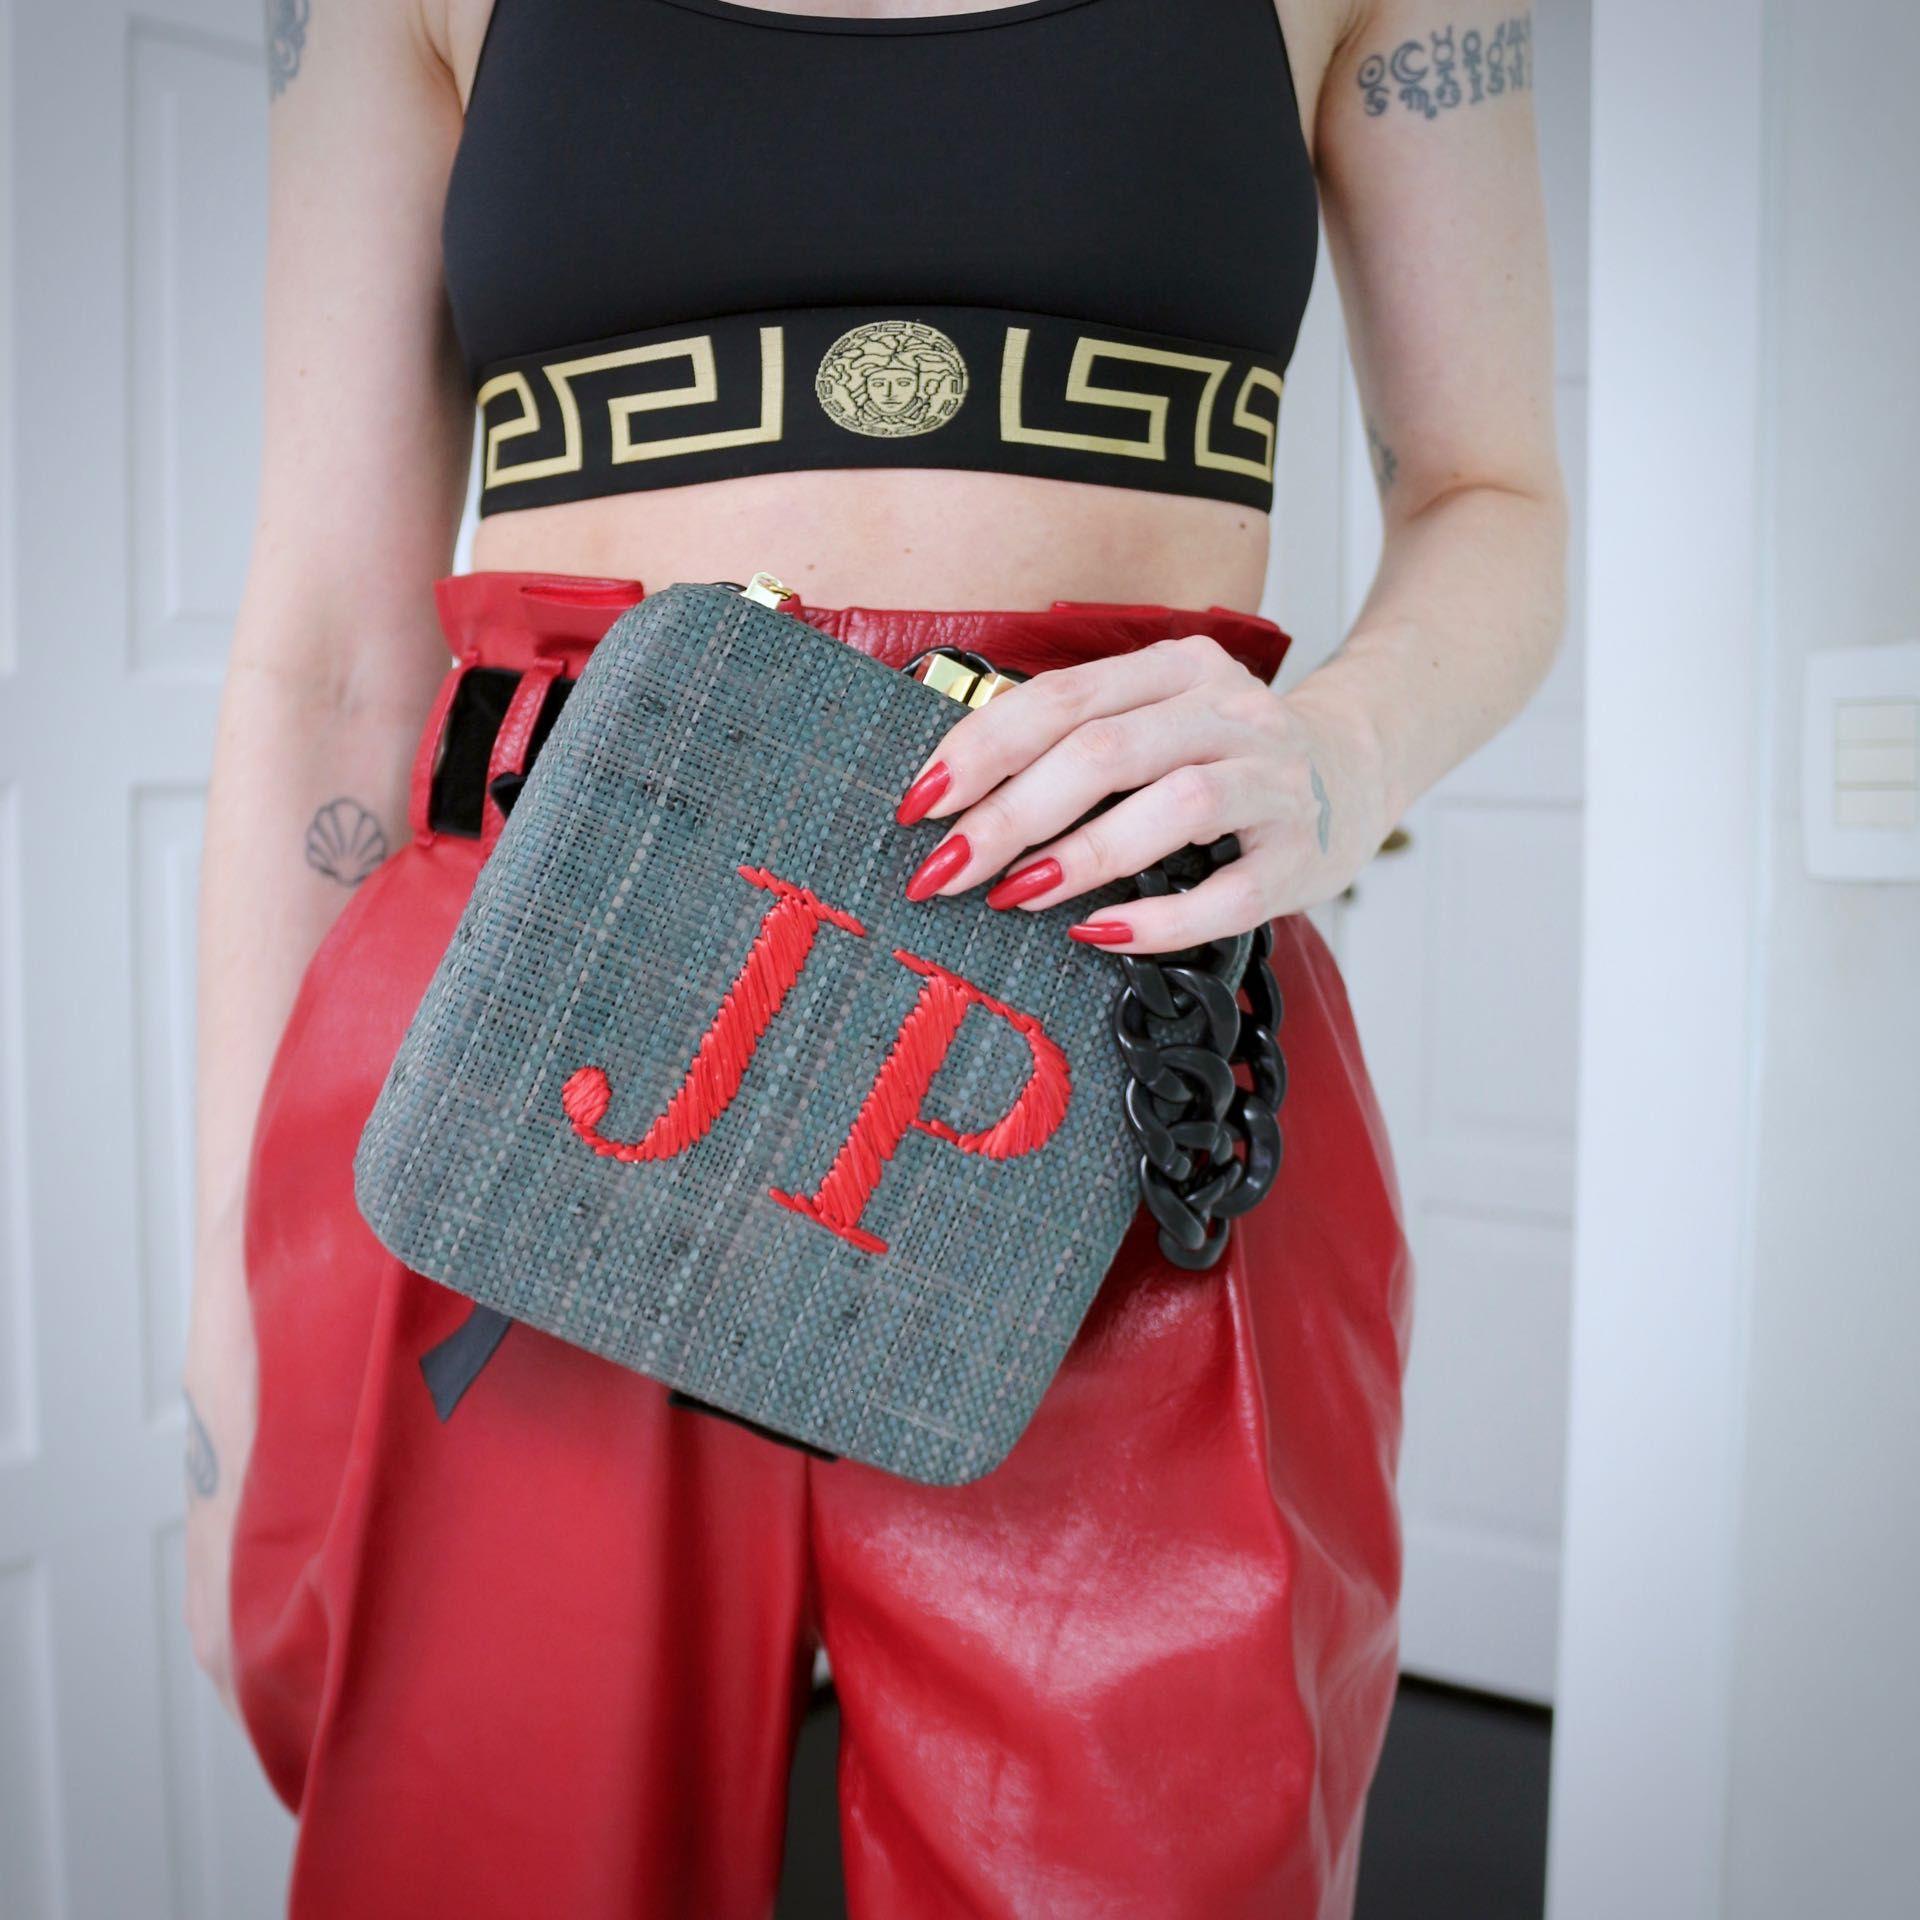 calça Philosophy Di Lorenzo Serafini, top Versace, bolsa Serpui Marie